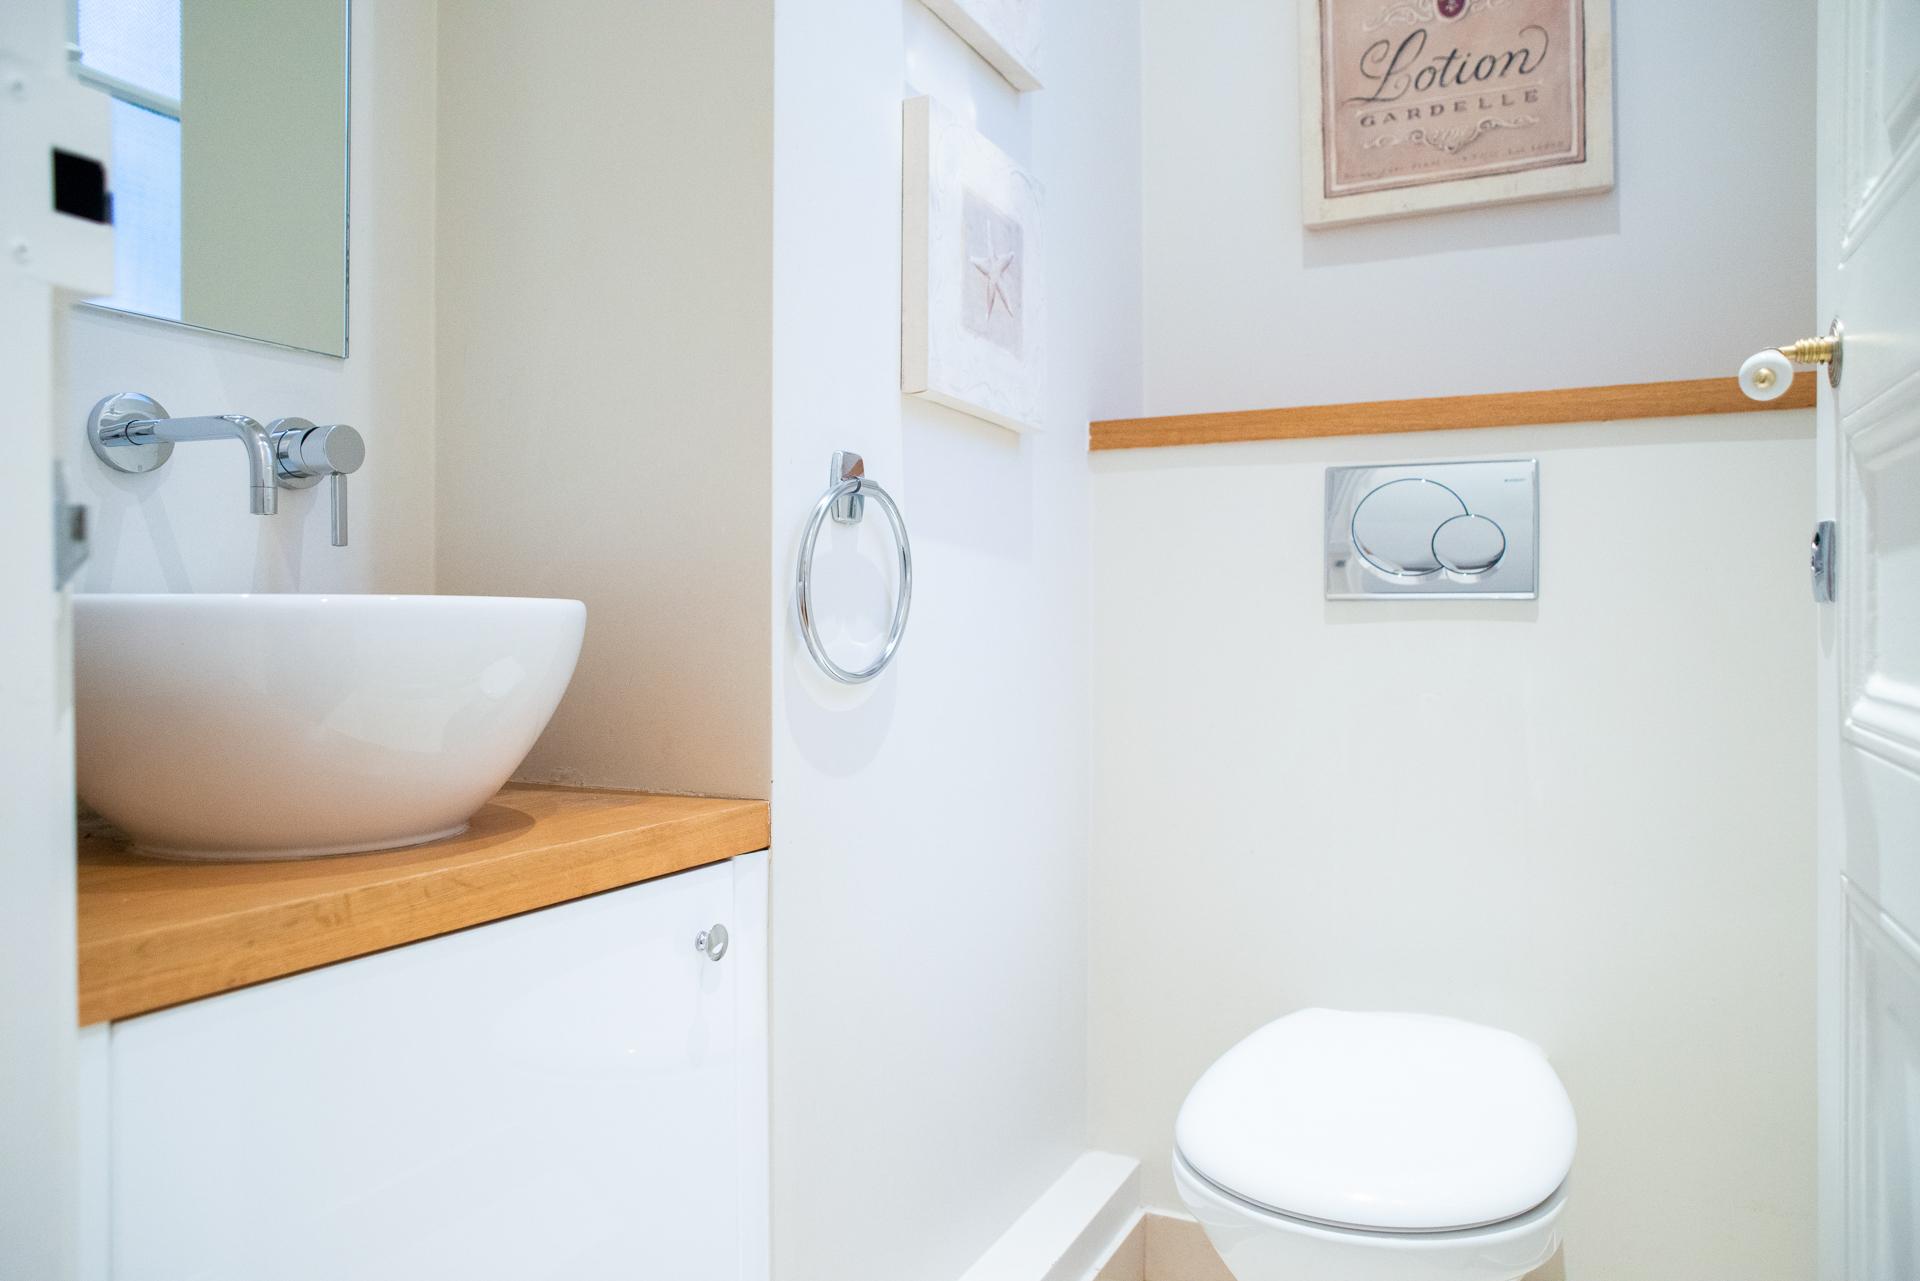 Half-bath in the Corent apartment by Paris Perfect